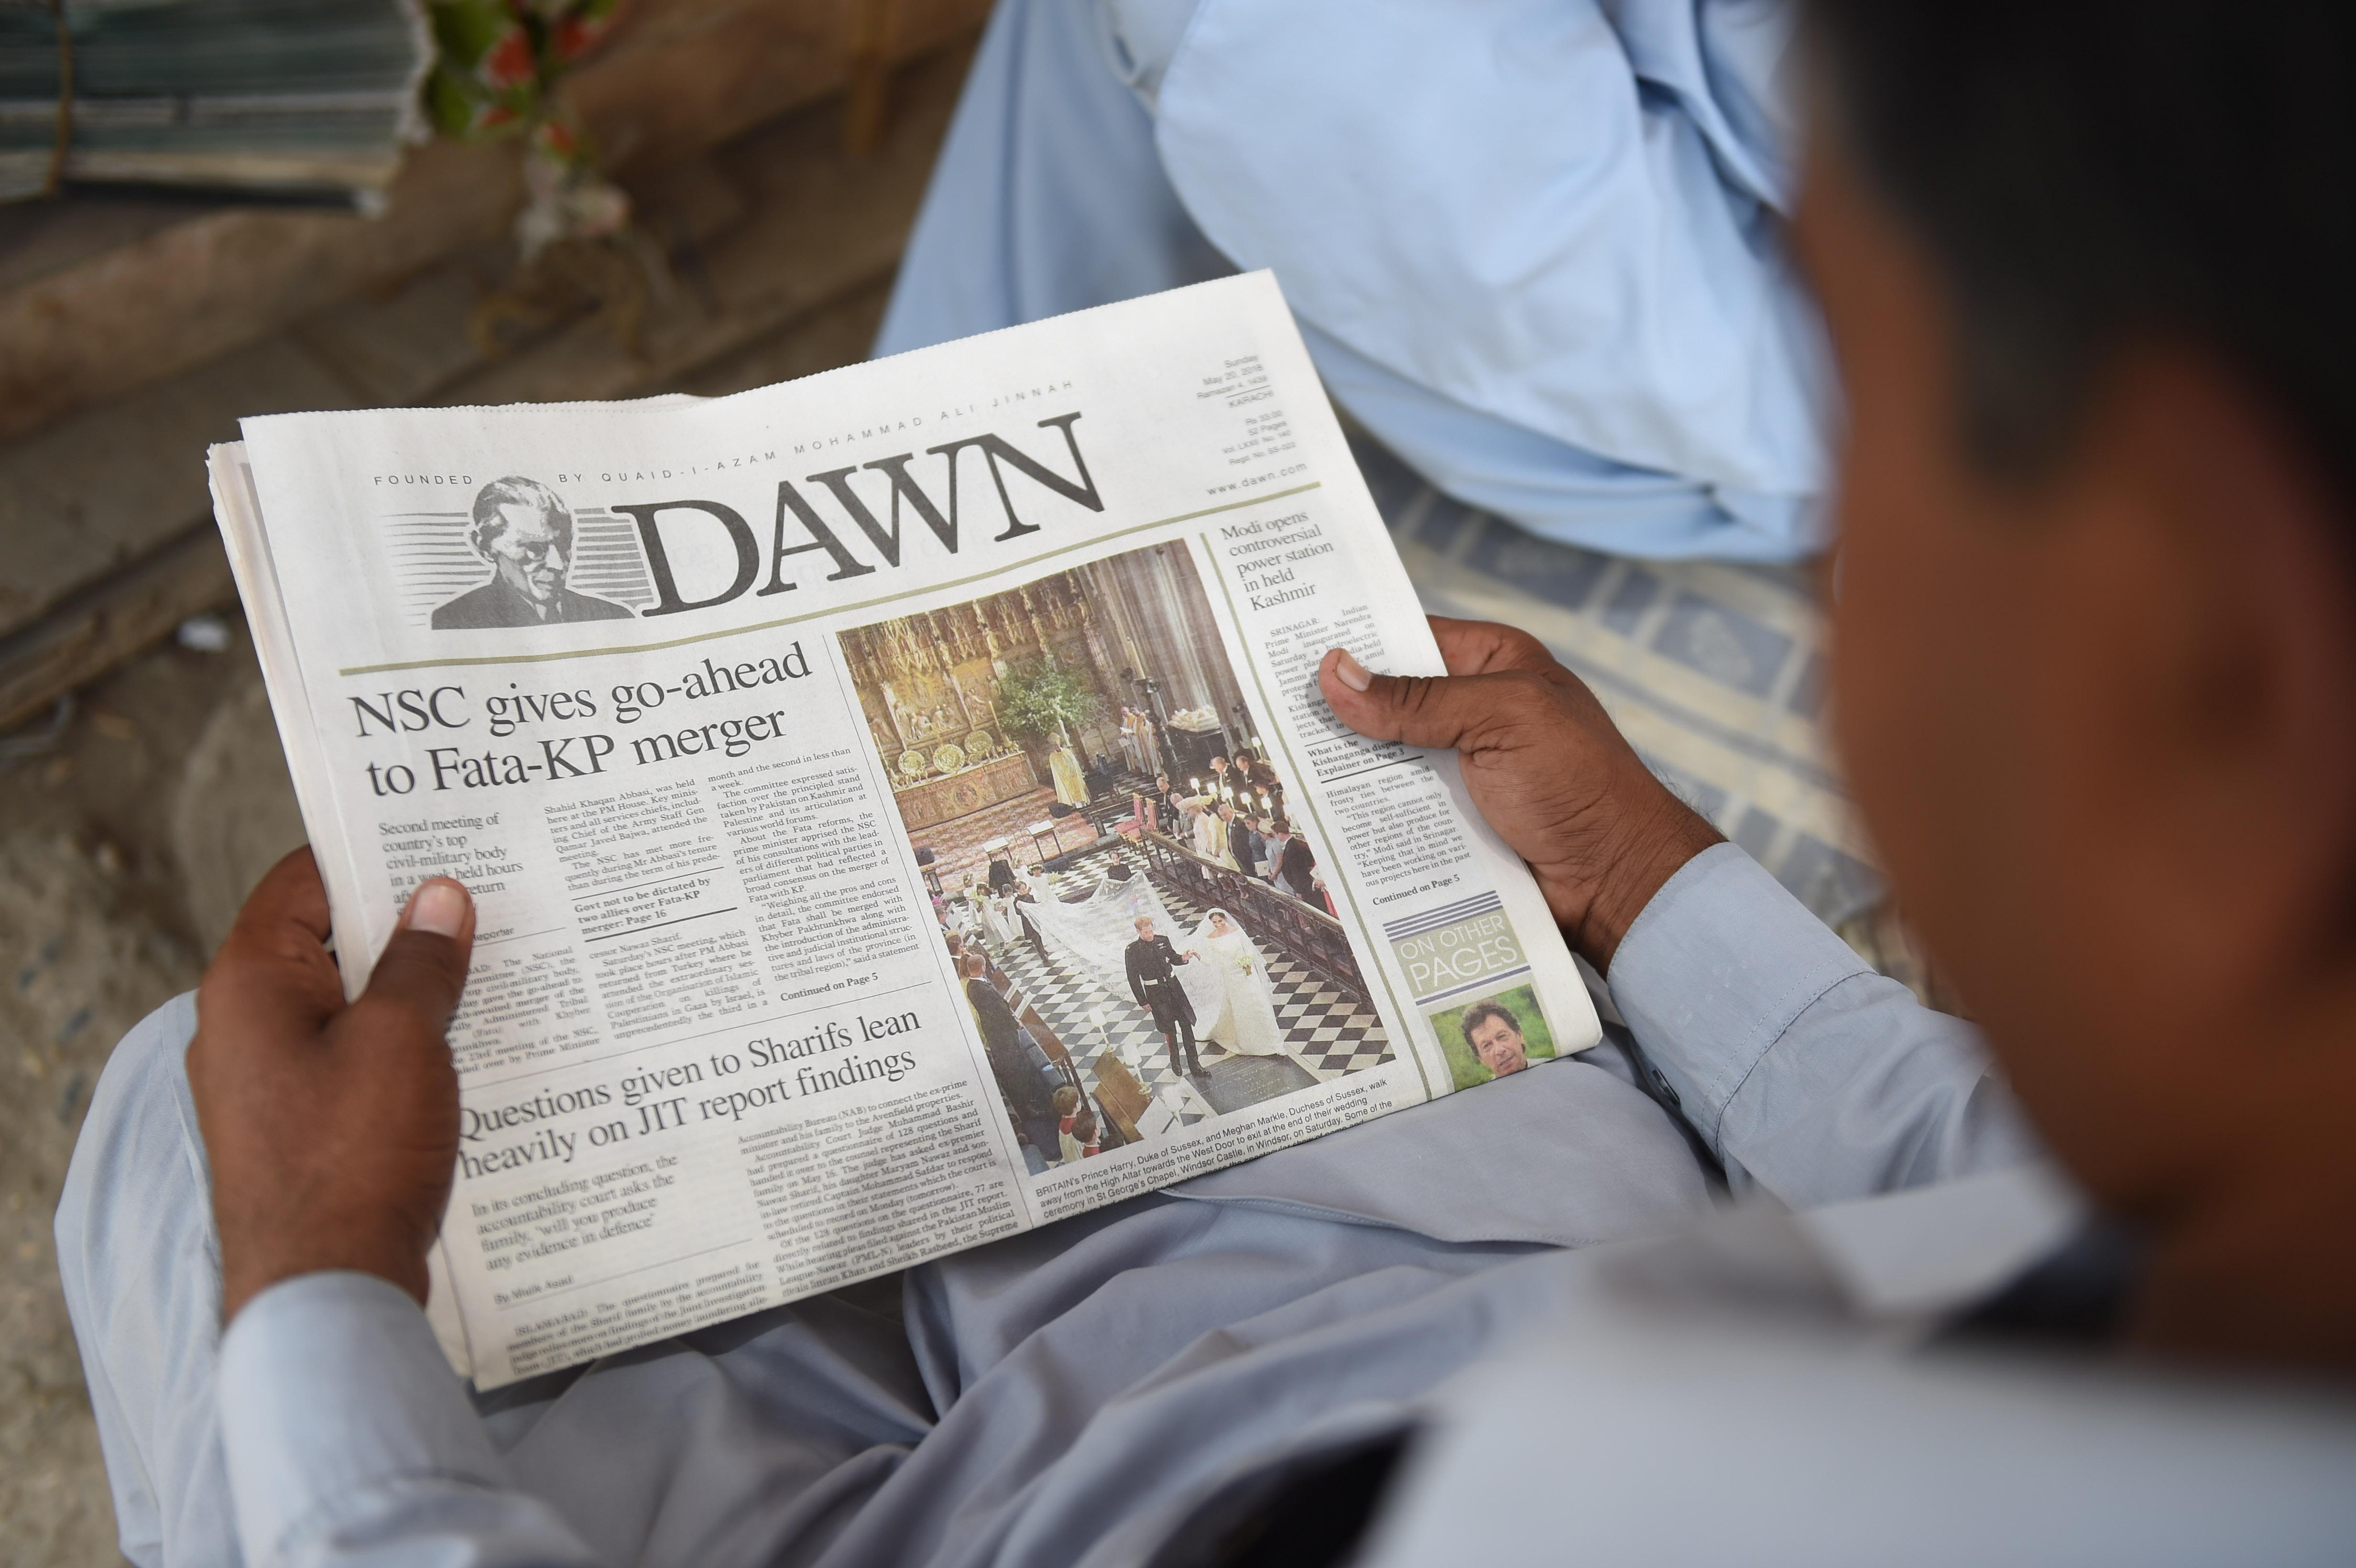 A Pakistan man reads a copy of the Dawn English-language newspaper. (Photo by RIZWAN TABASSUM / AFP)